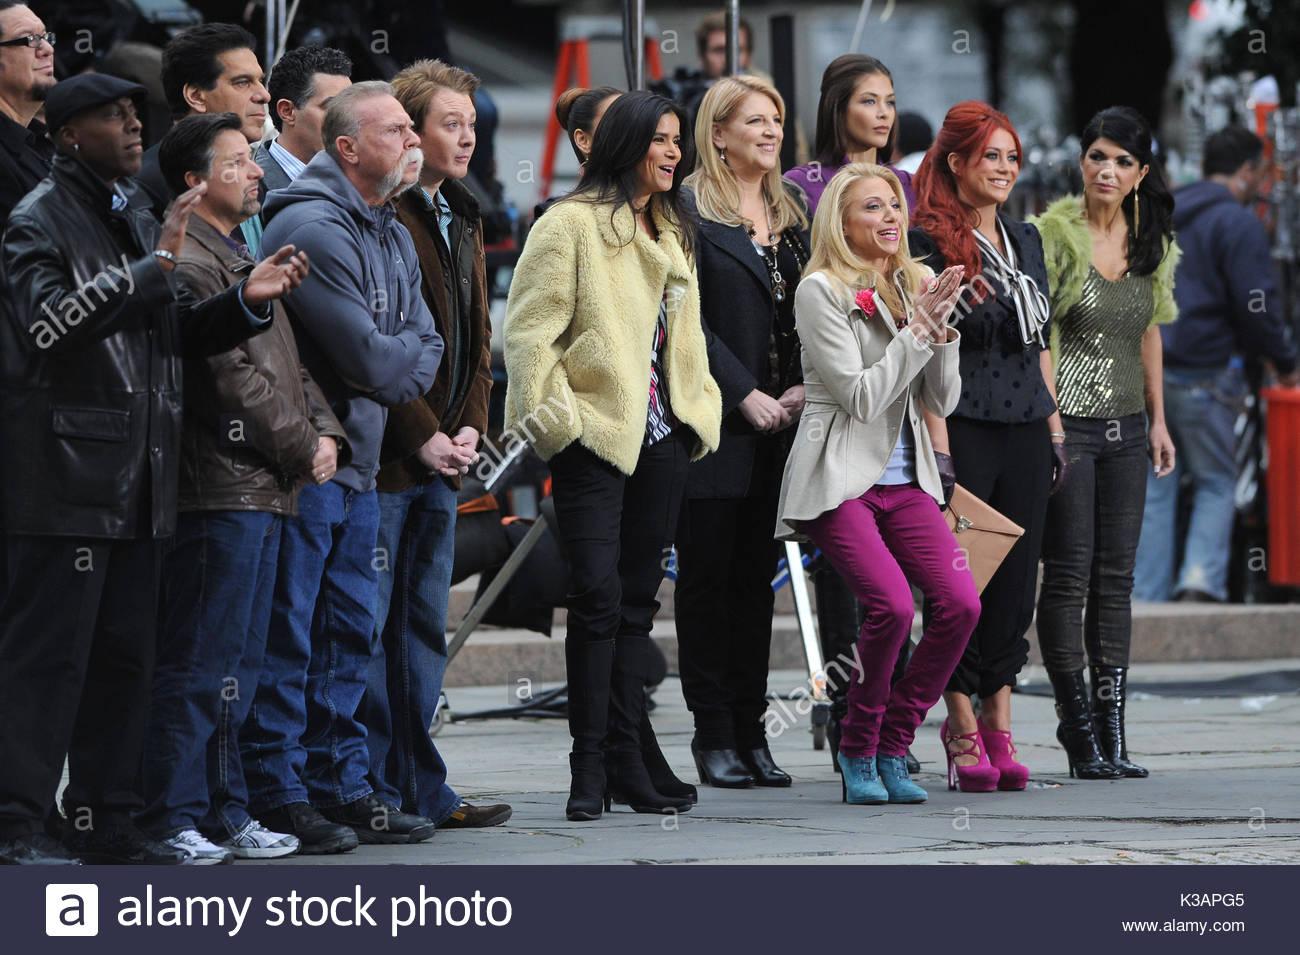 'Celebrity Apprentice' season 5 cast announced   EW.com